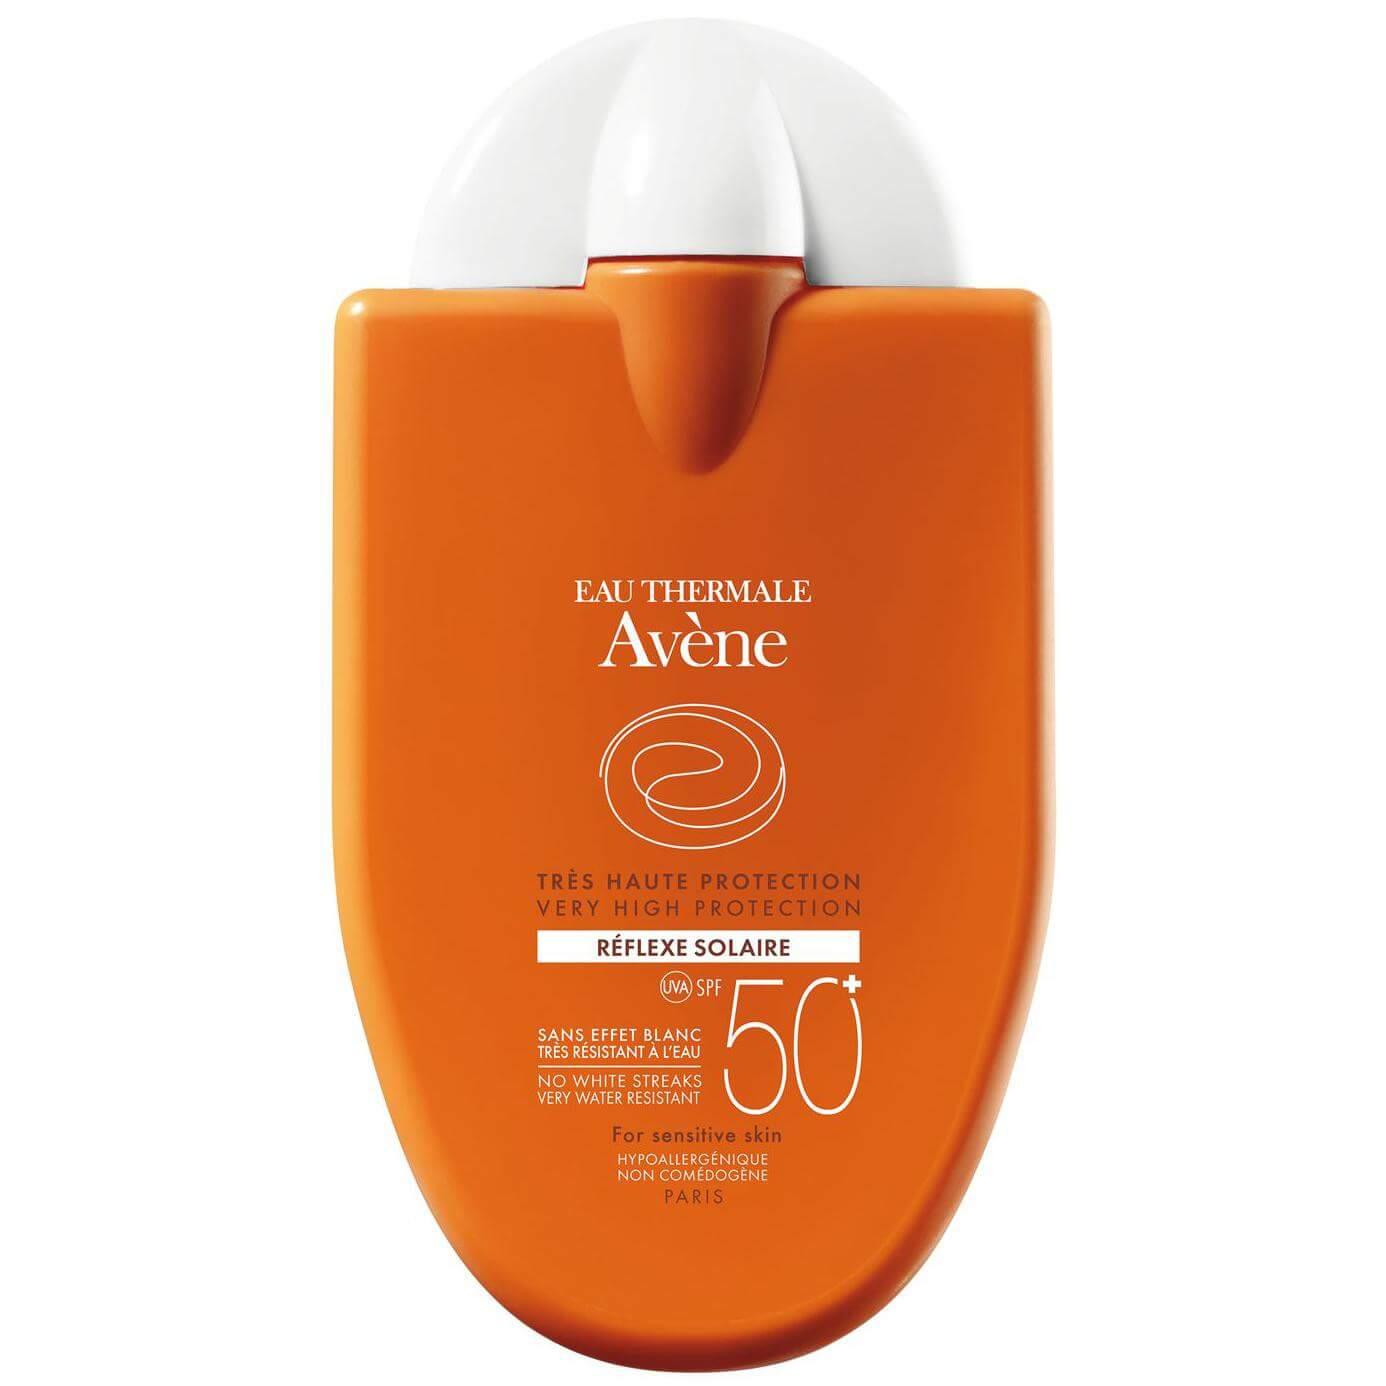 Avene Reflexe Solaire Dry Touch Spf50+ Πολύ Υψηλή Αντηλιακή Προστασία Προσώπου, για Φωτοευαίσθητα Δέρματα 30ml